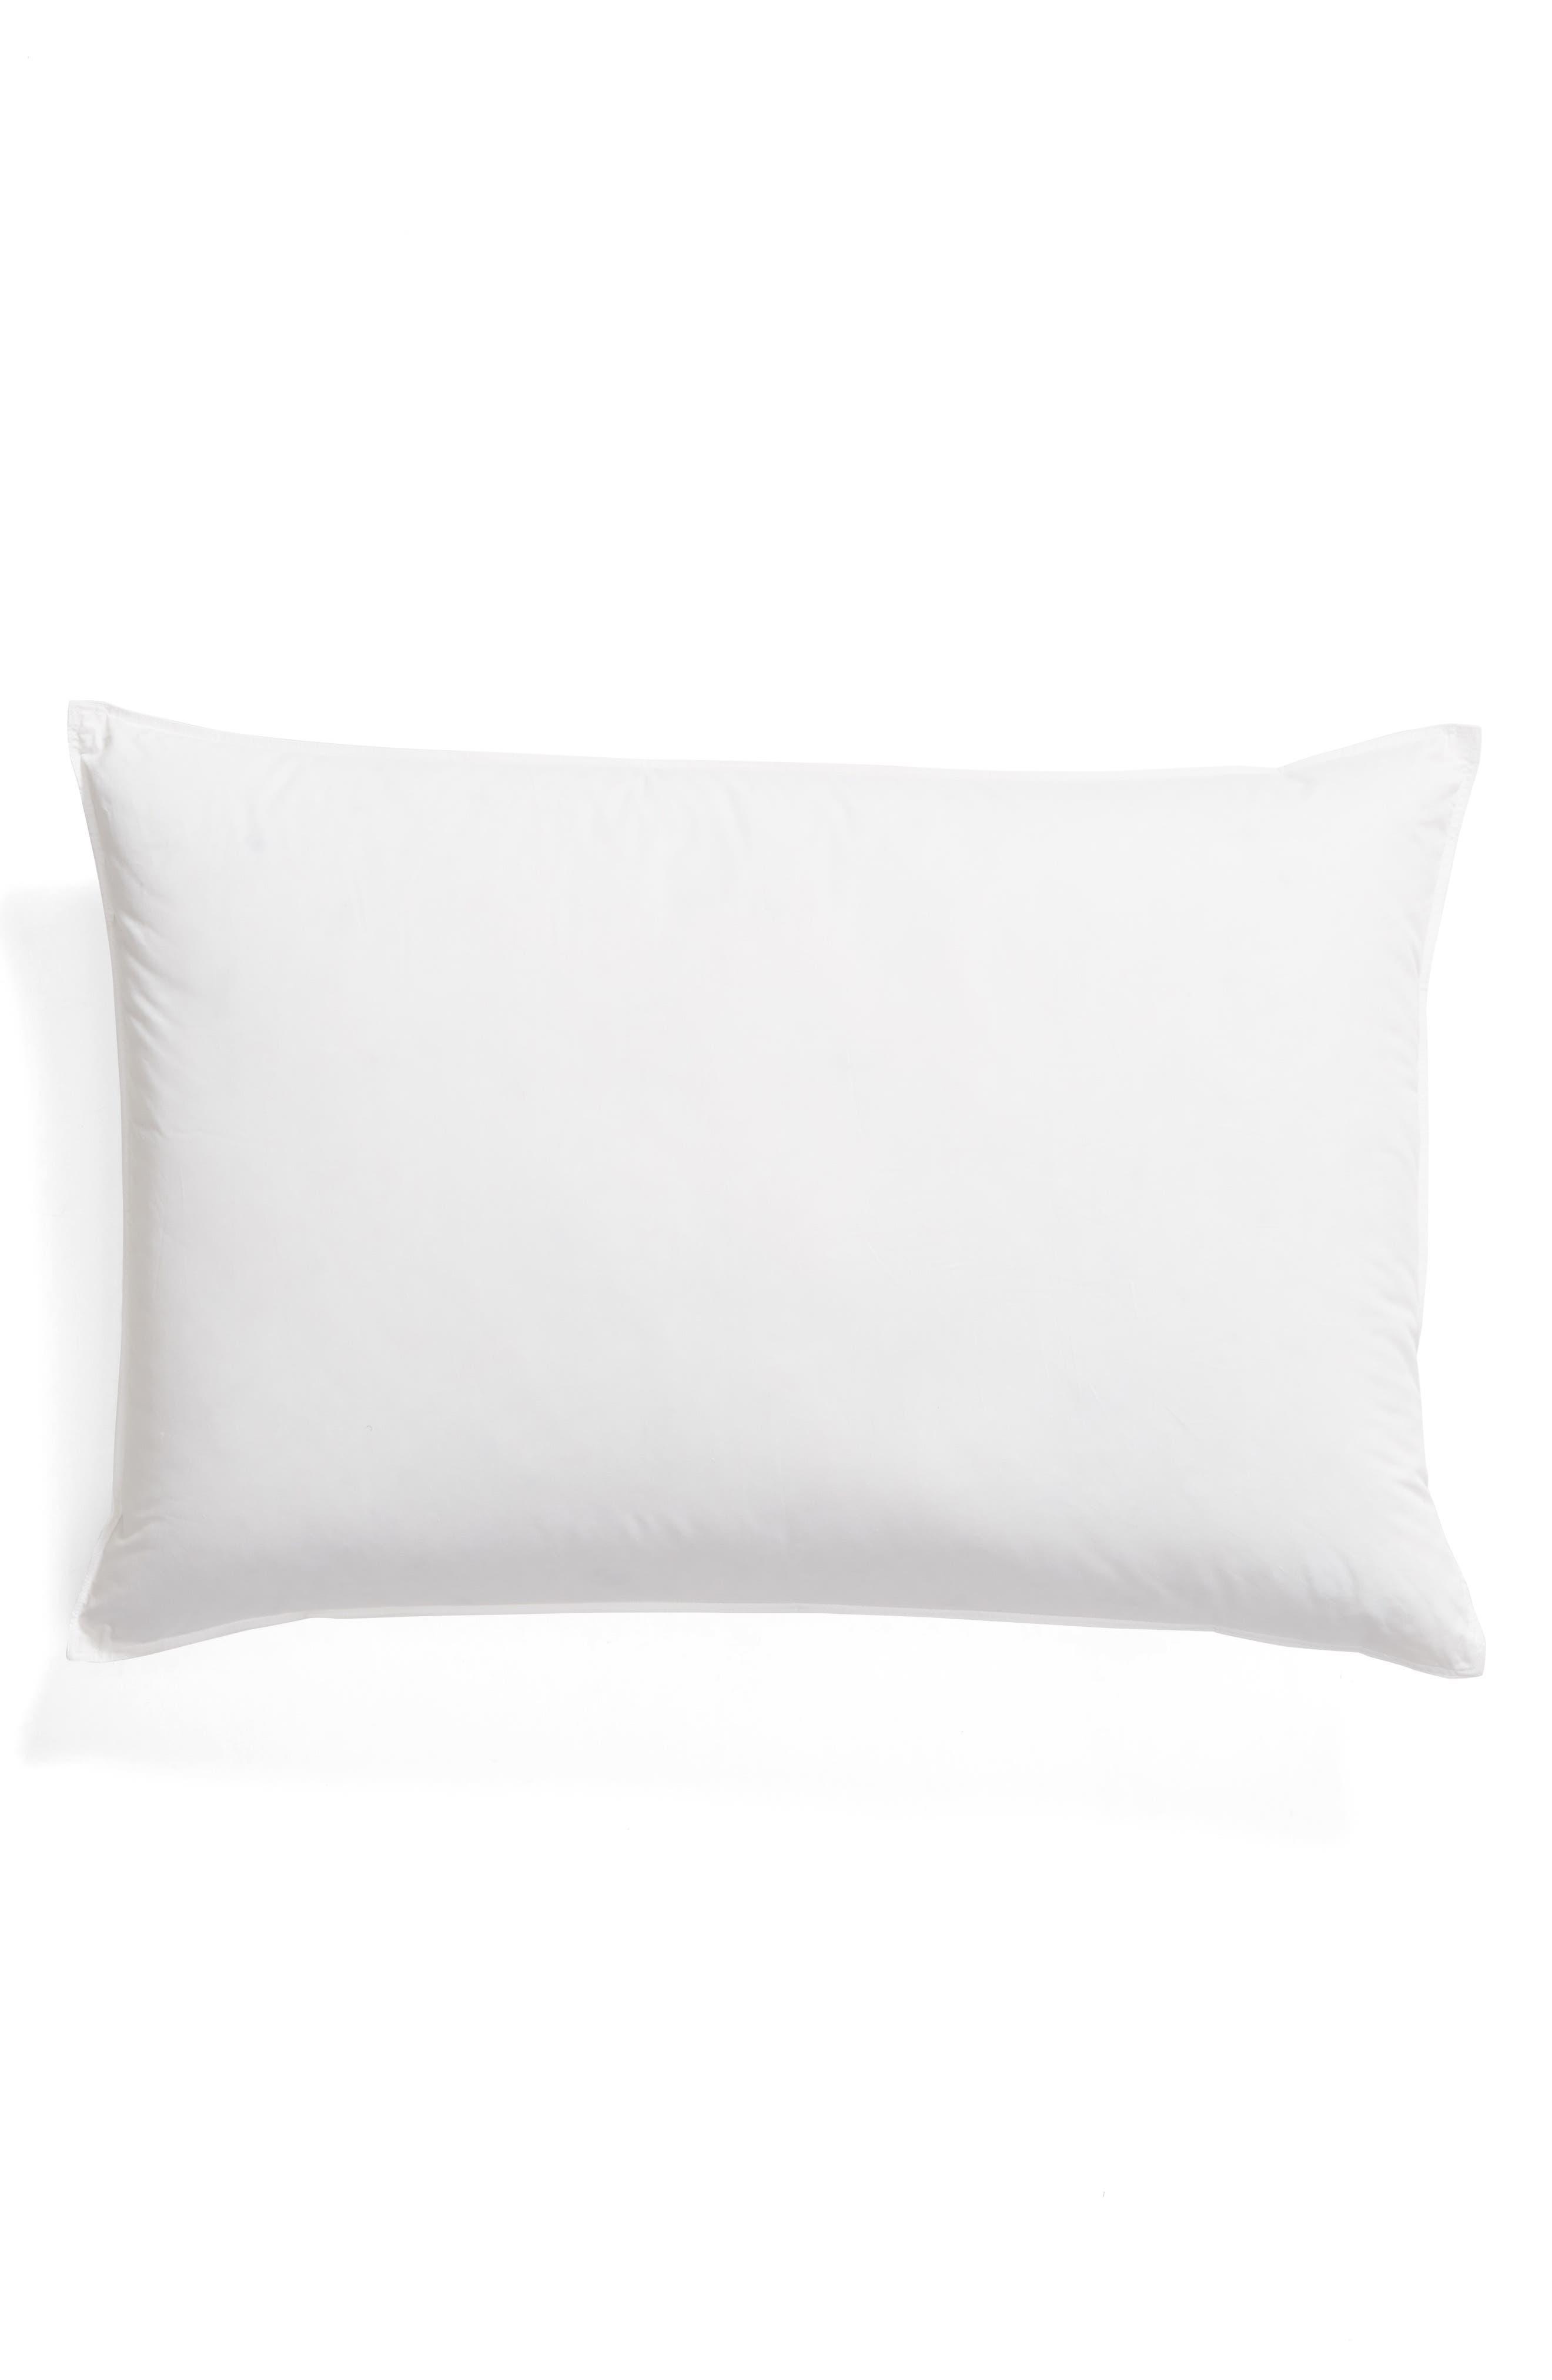 MATOUK Valletto Medium 650 Fill Power Down 400 Thread Count Pillow, Main, color, WHITE